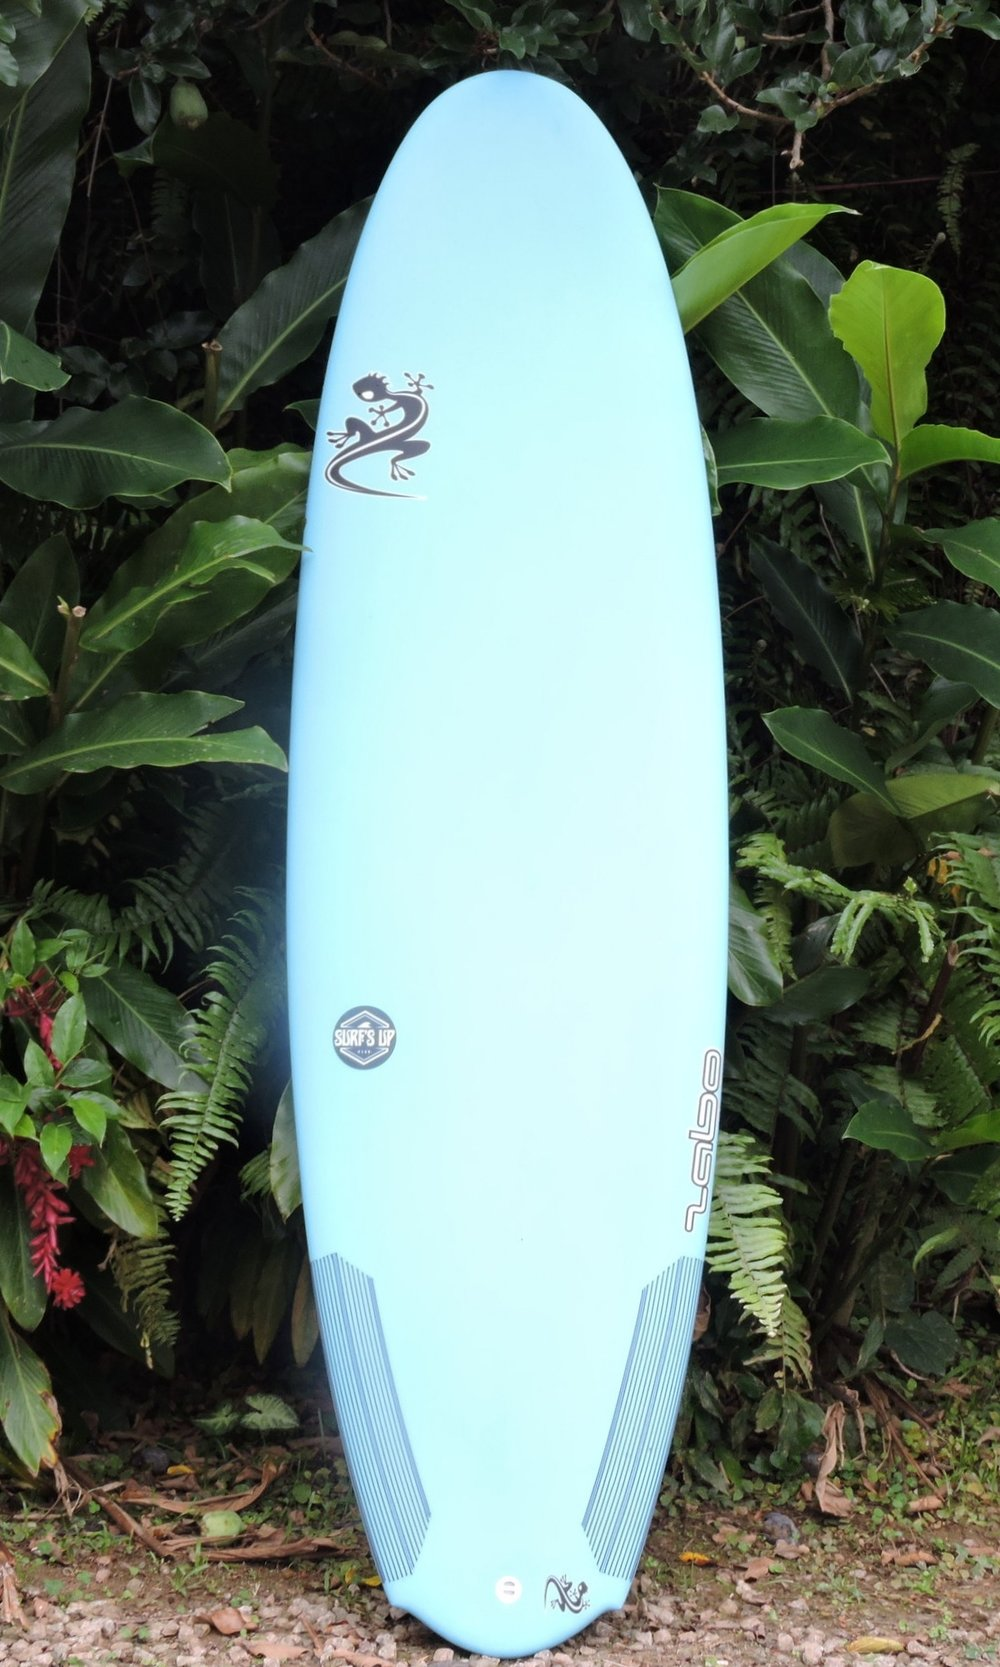 Shark Bomb - Zabo Surfboards5'8